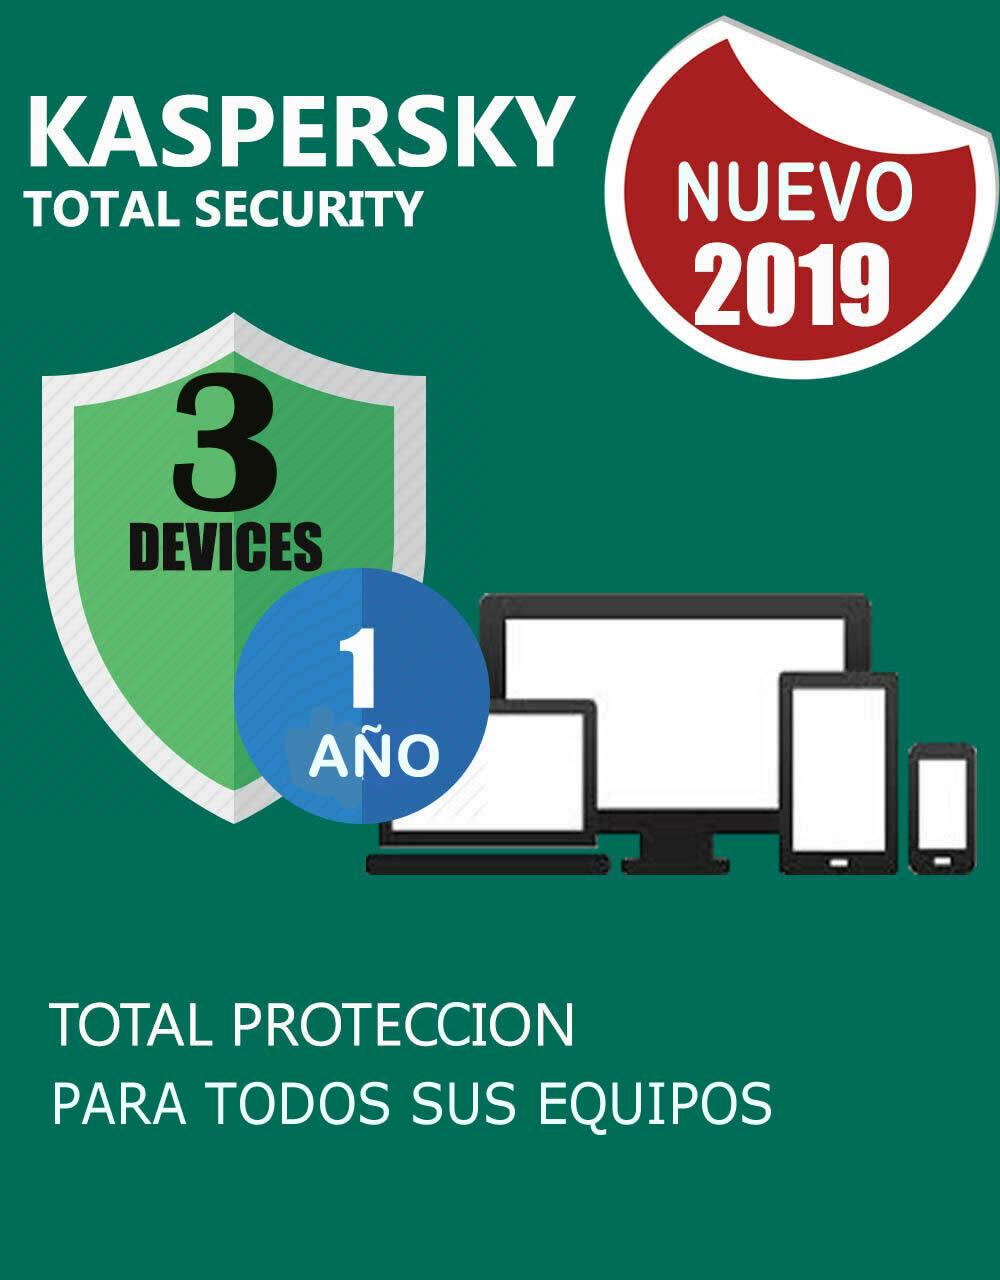 Kaspersky Total Security 3 Pc 1 Año.(Para almacenar)